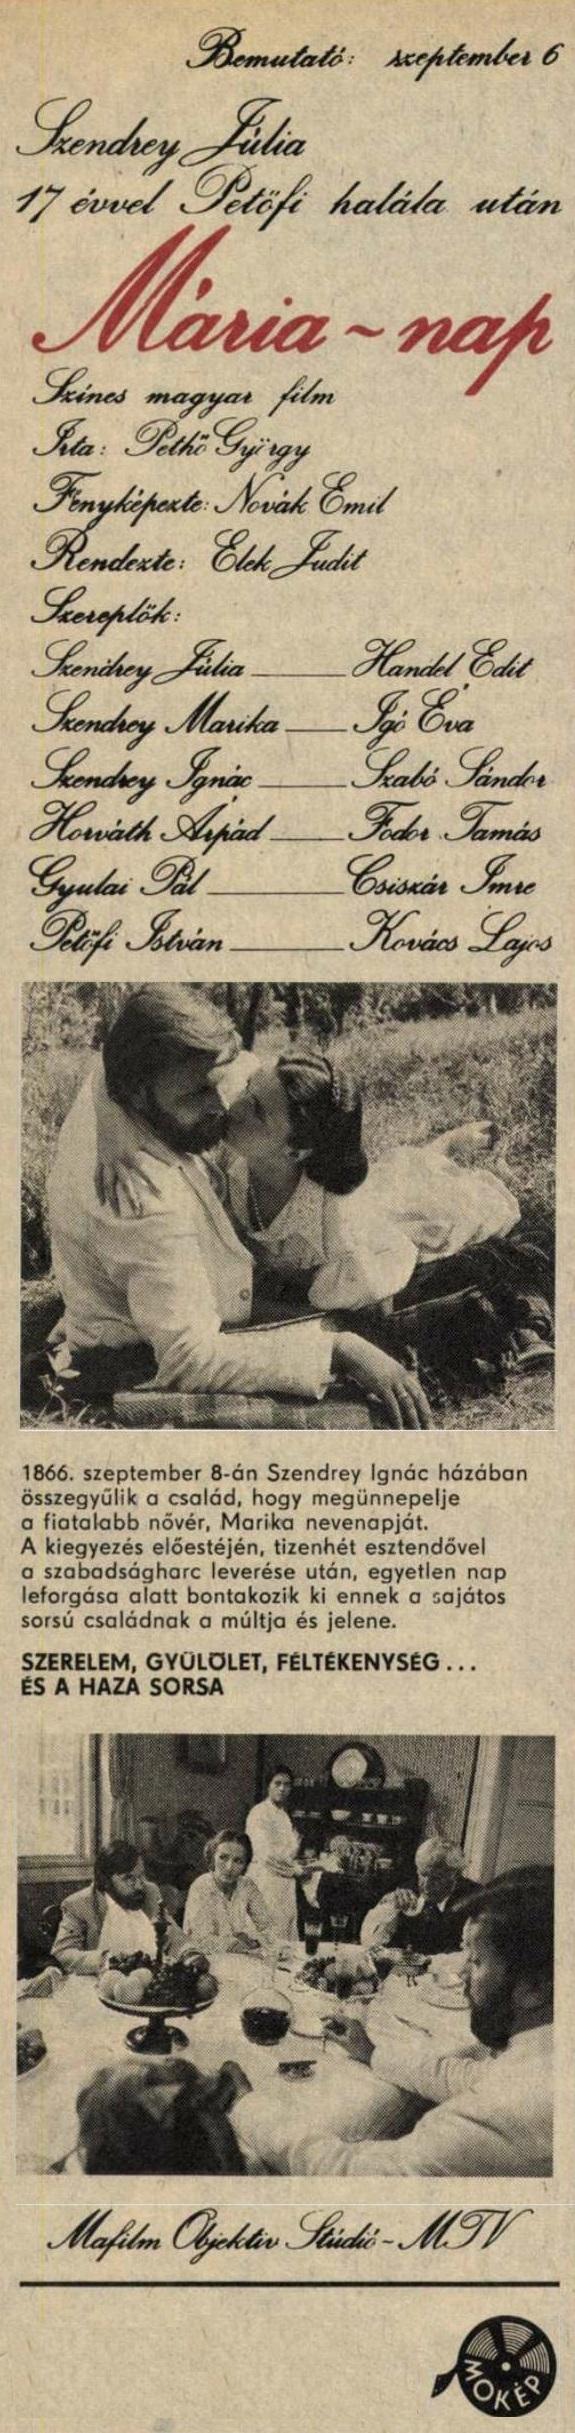 idokapszula_nb_i_1983_84_magyarorszag_mexiko_mozi.jpg